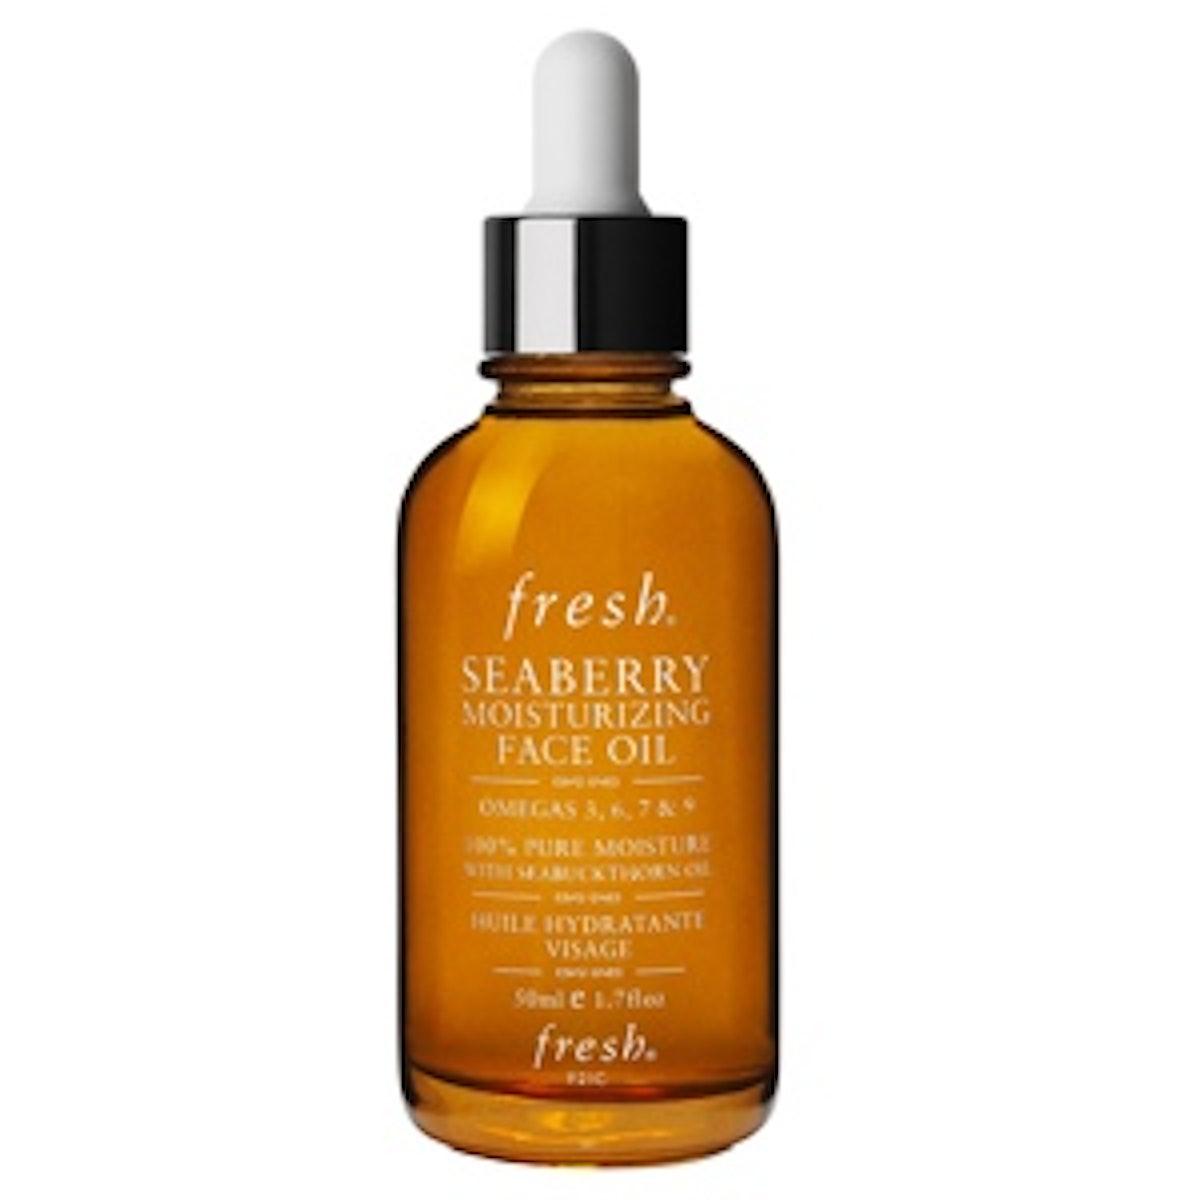 Seaberry Moisturizing Face Oil